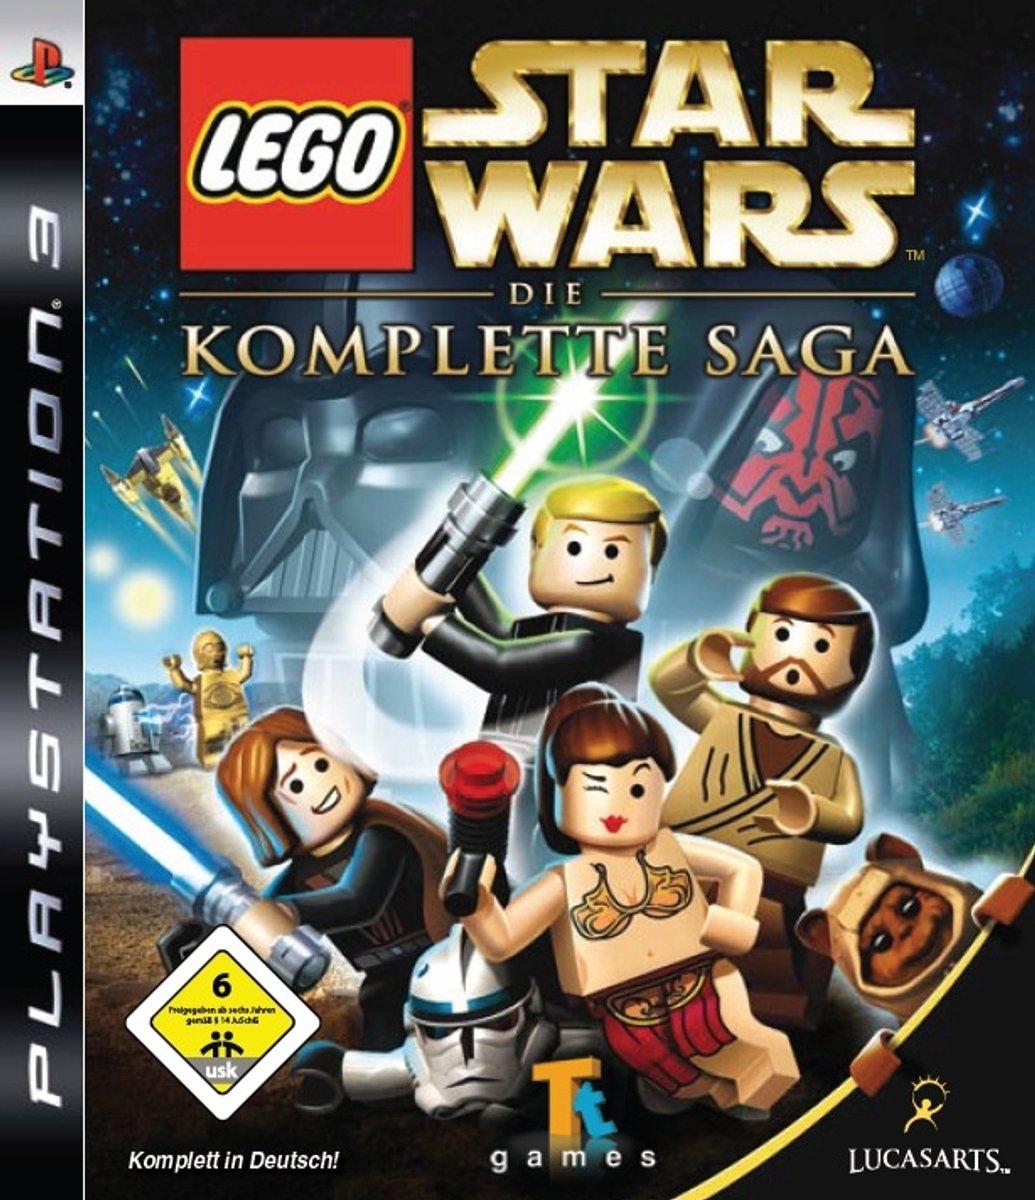 Lego Star Wars - Die komplette Saga: Playstation 3: Amazon.de: Games